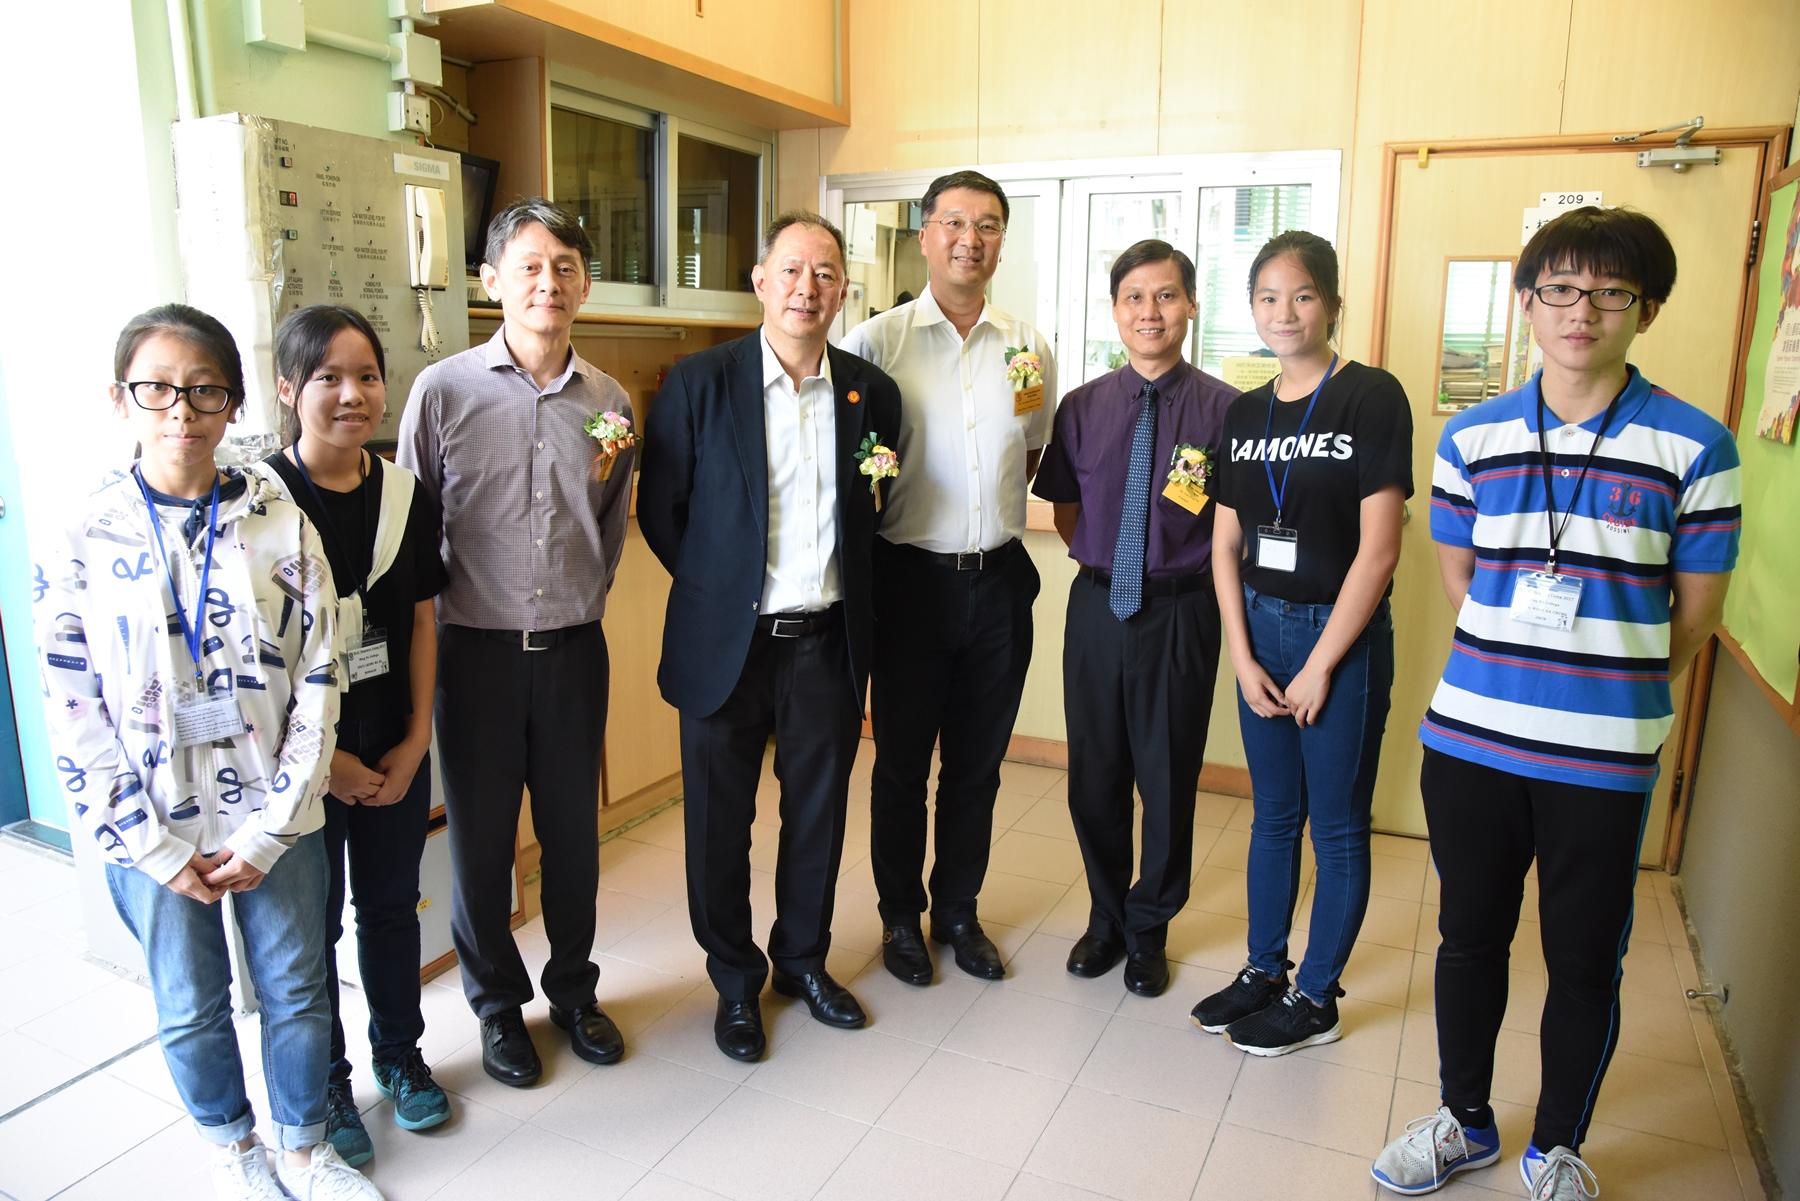 http://www.npc.edu.hk/sites/default/files/dsc_0122.jpg